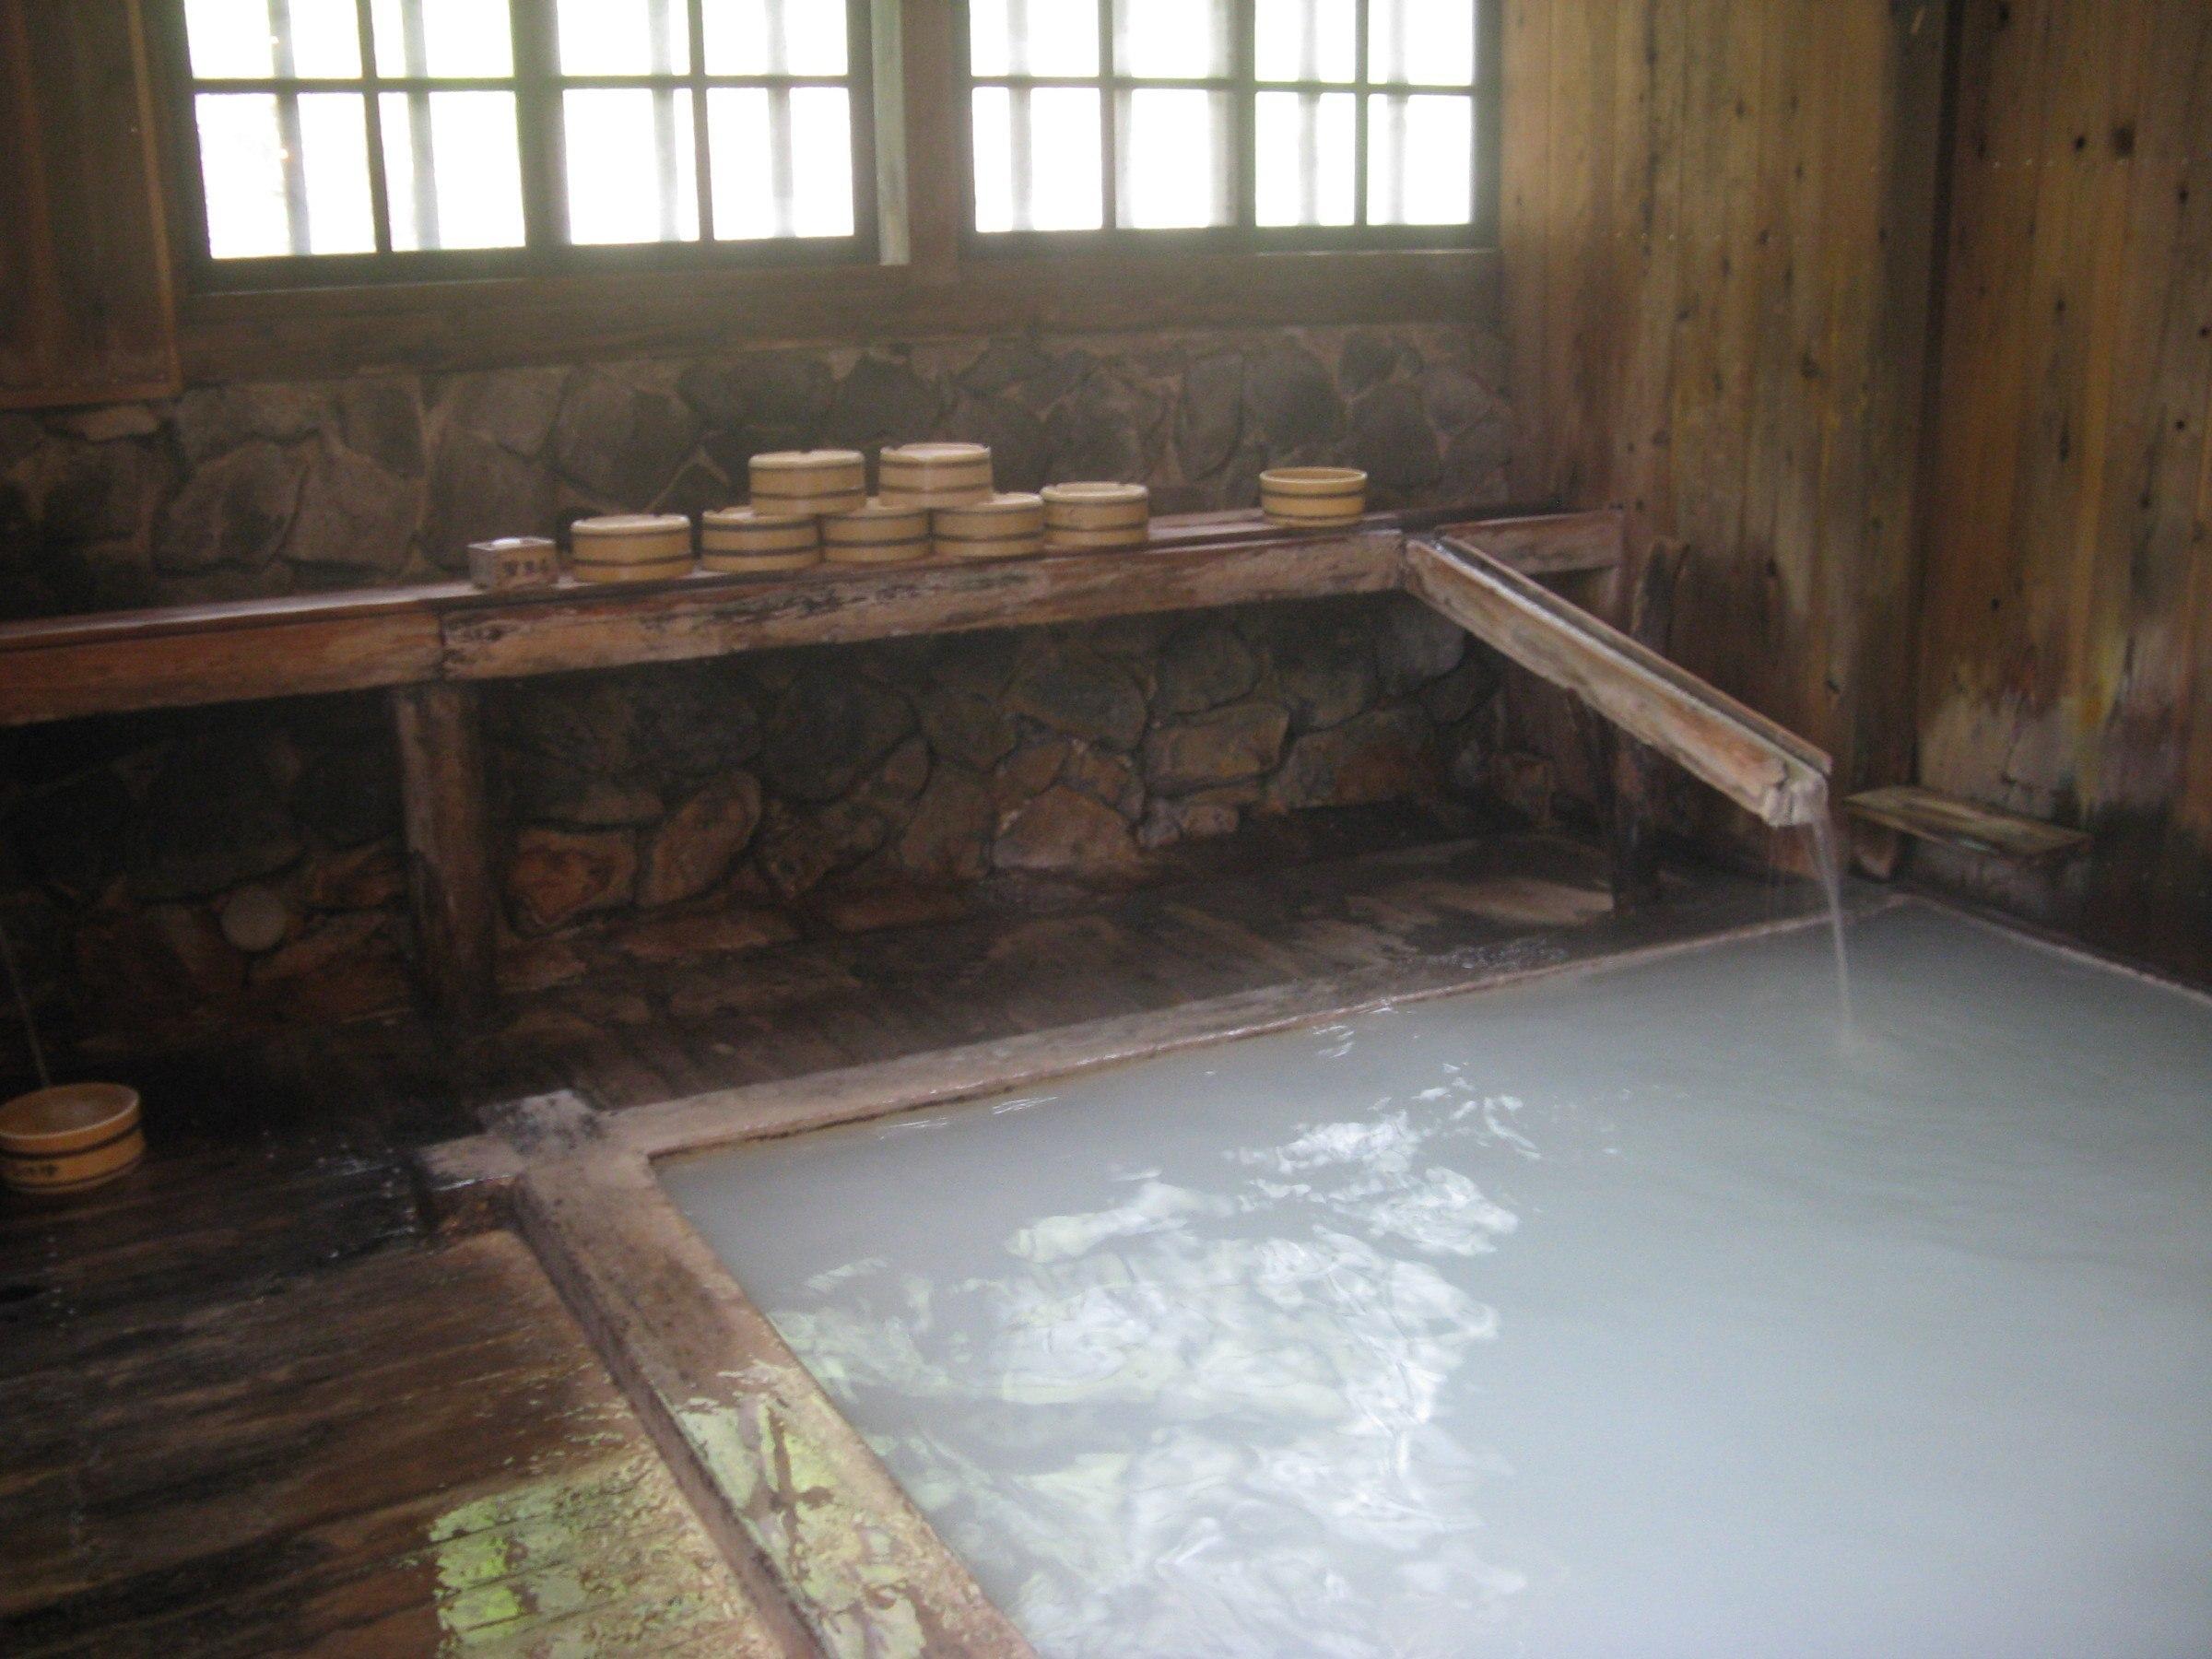 Japanese public sauna